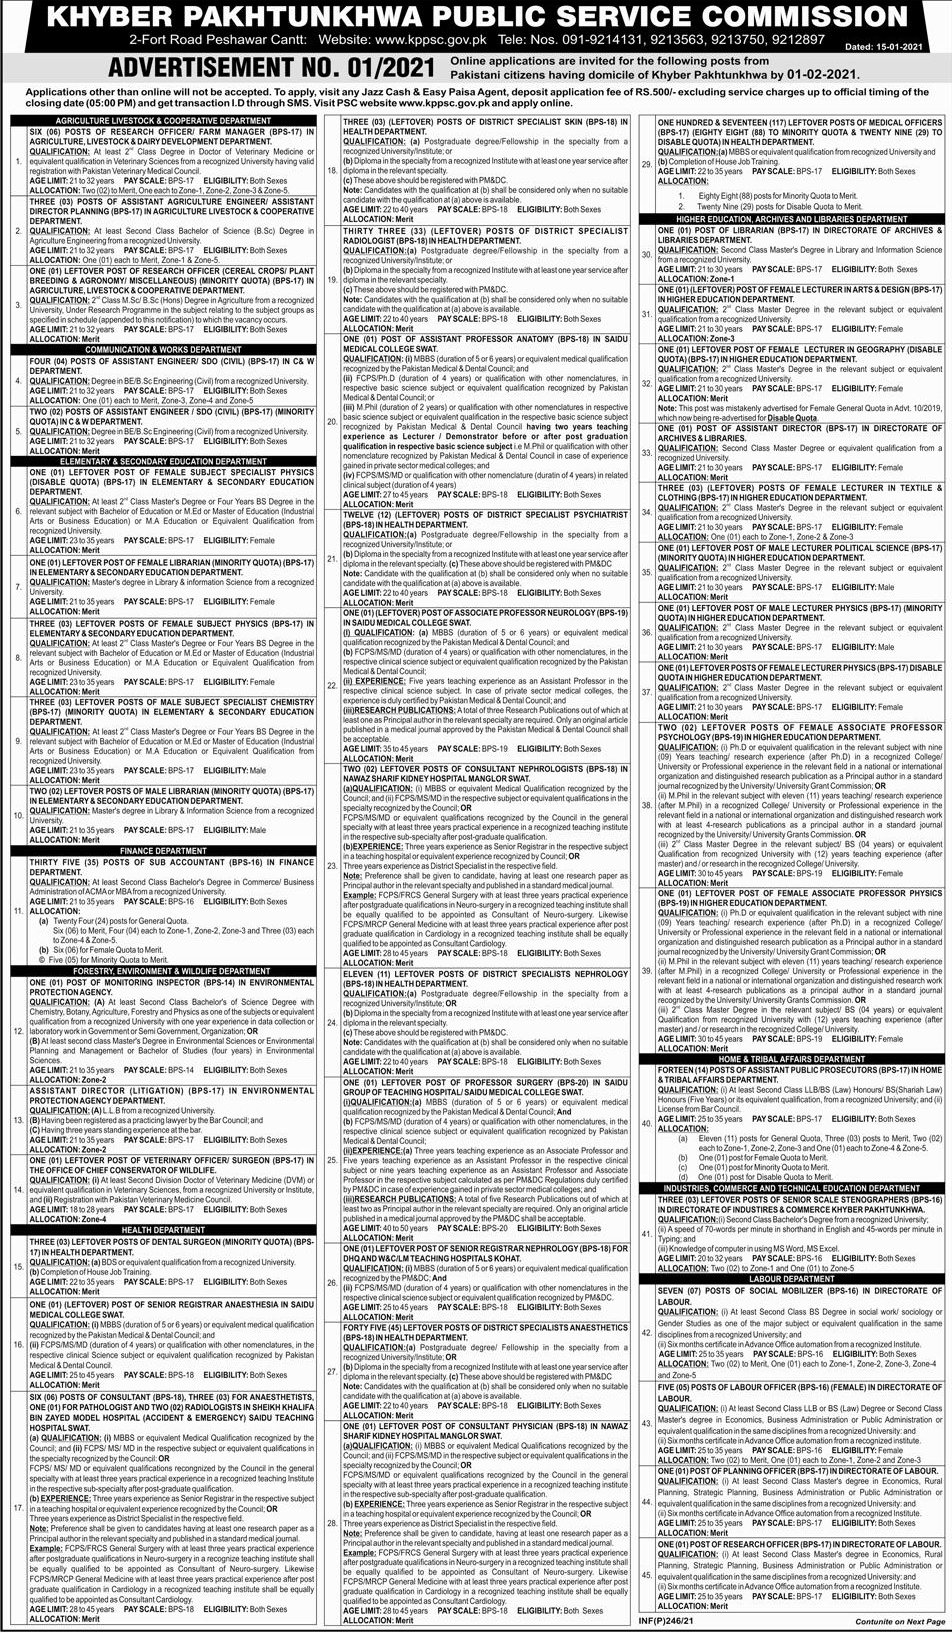 KPPSC Jobs Advertisement No. 1 2021, Apply Online